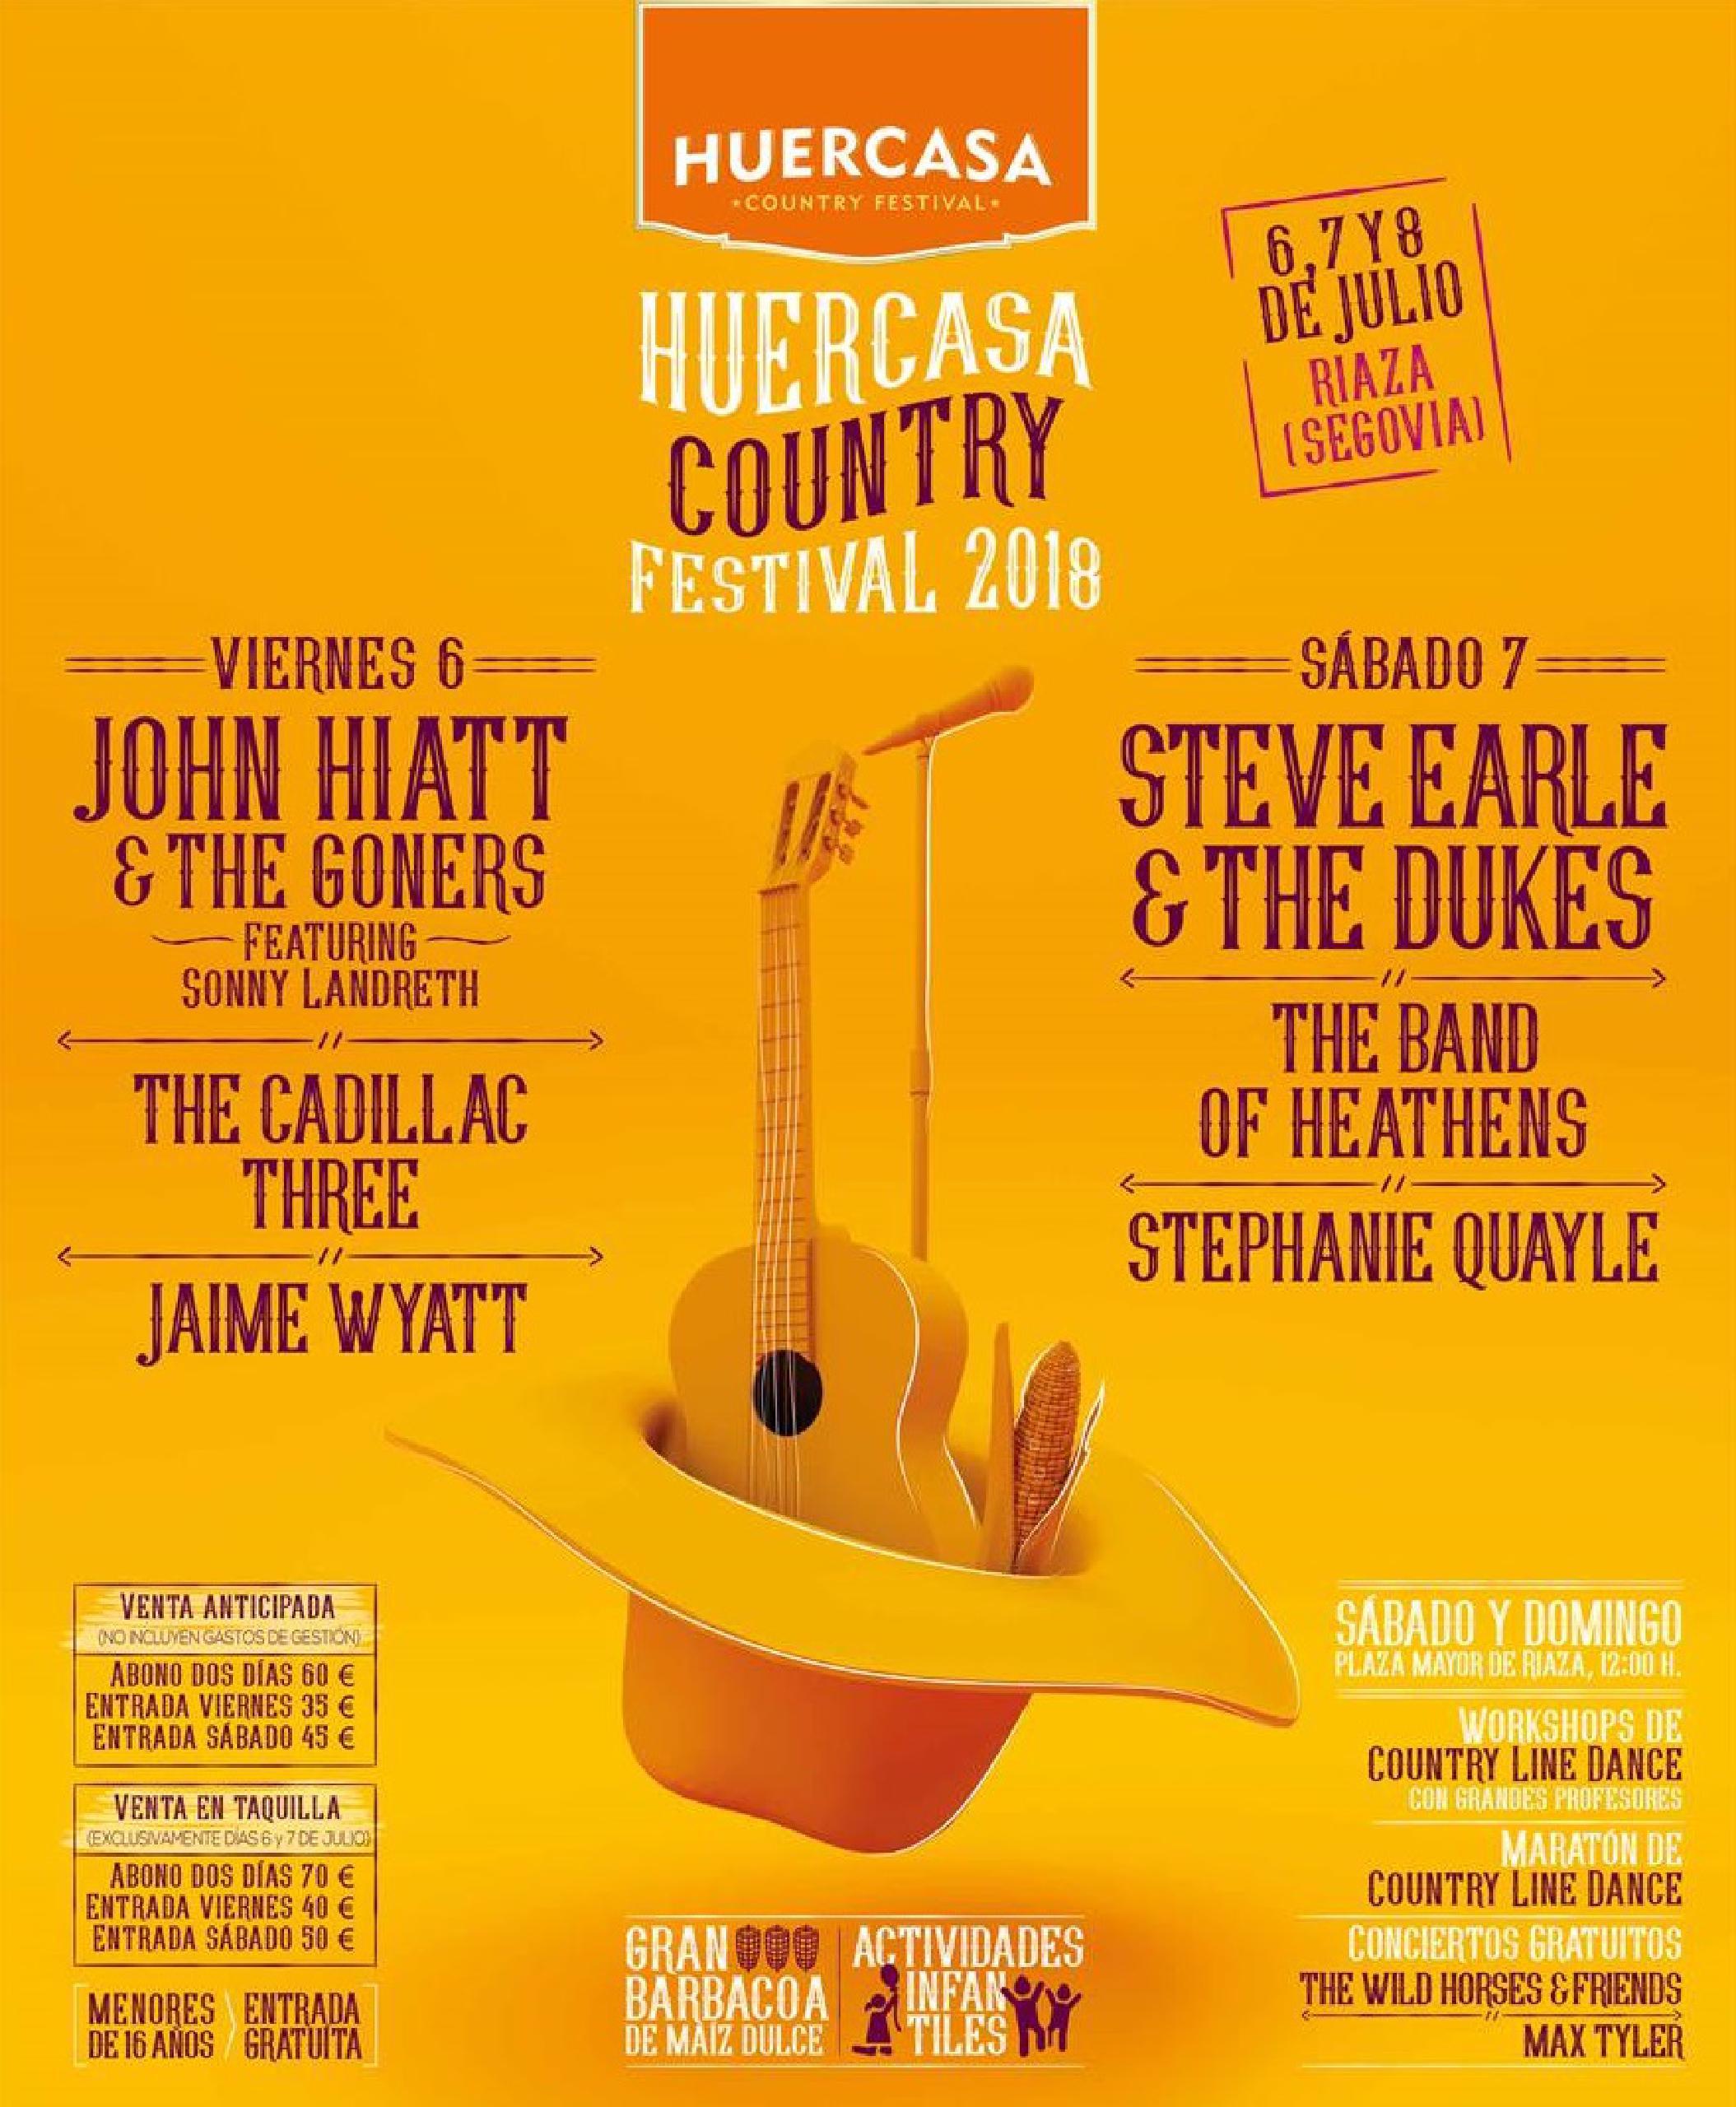 Cartel completo Huercasa Country Festival 2018